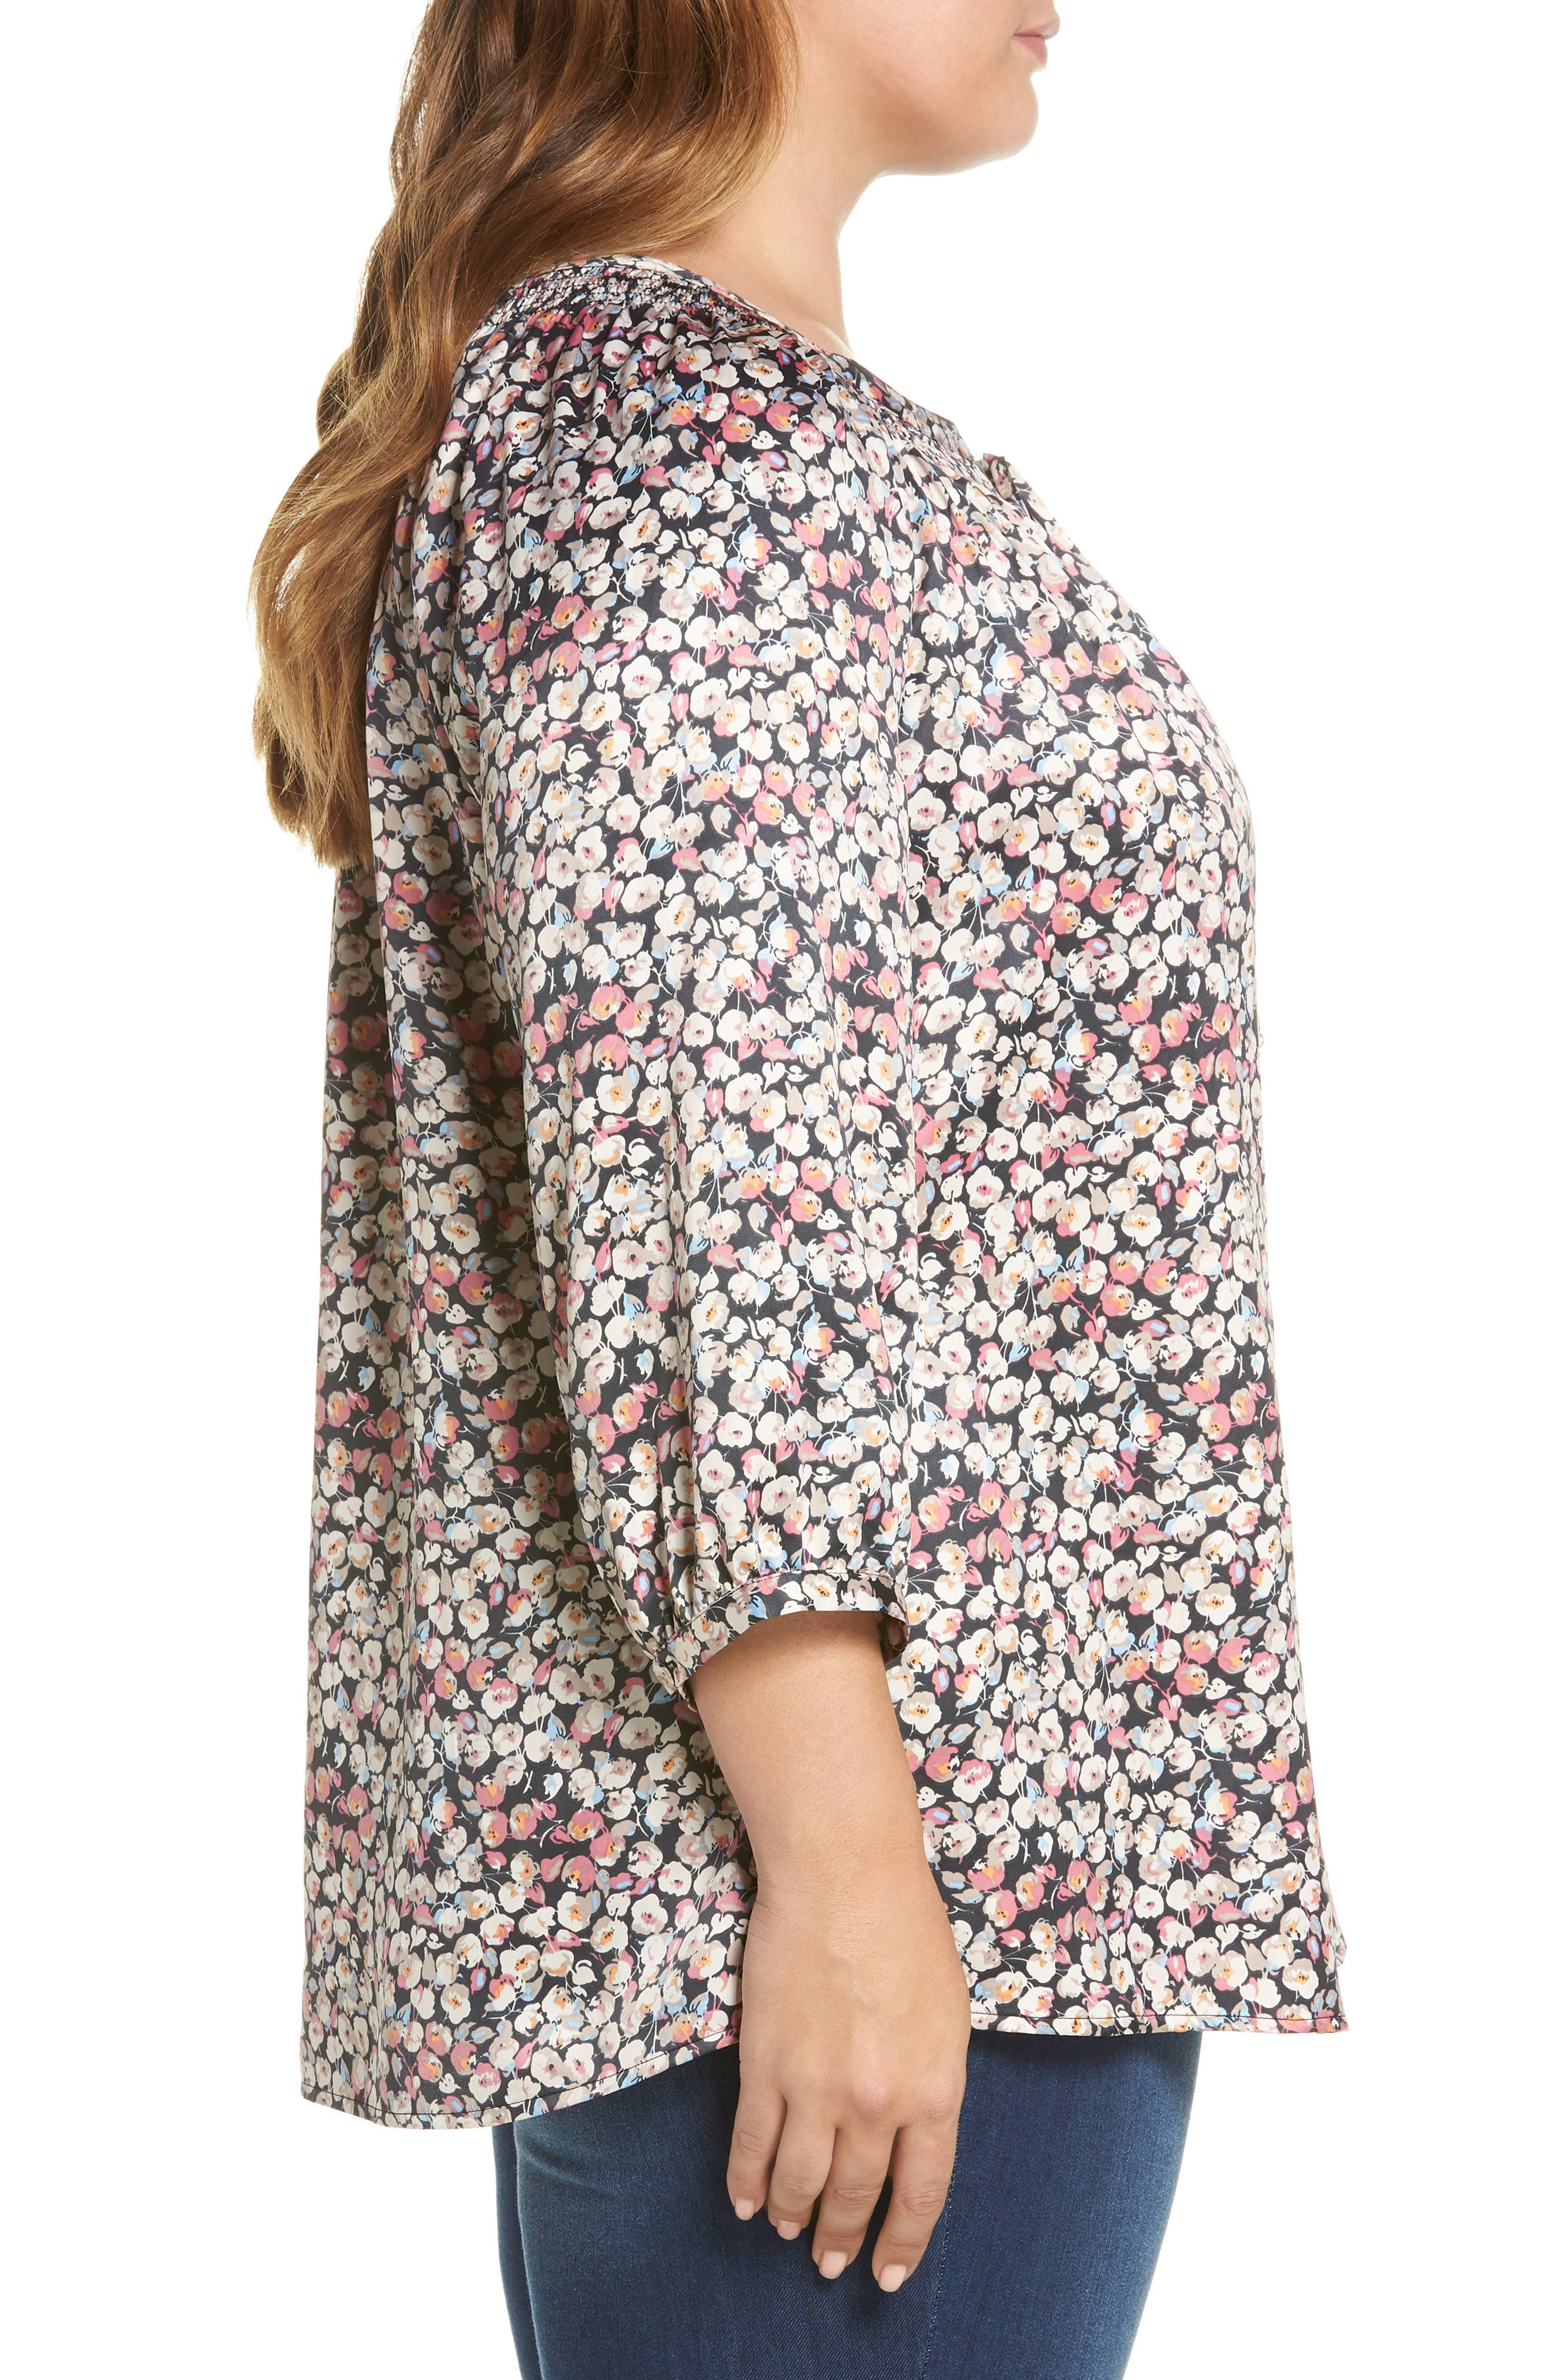 Floral Blouson Sleeve Blouse,                             Alternate thumbnail 3, color,                             B244n Mauve